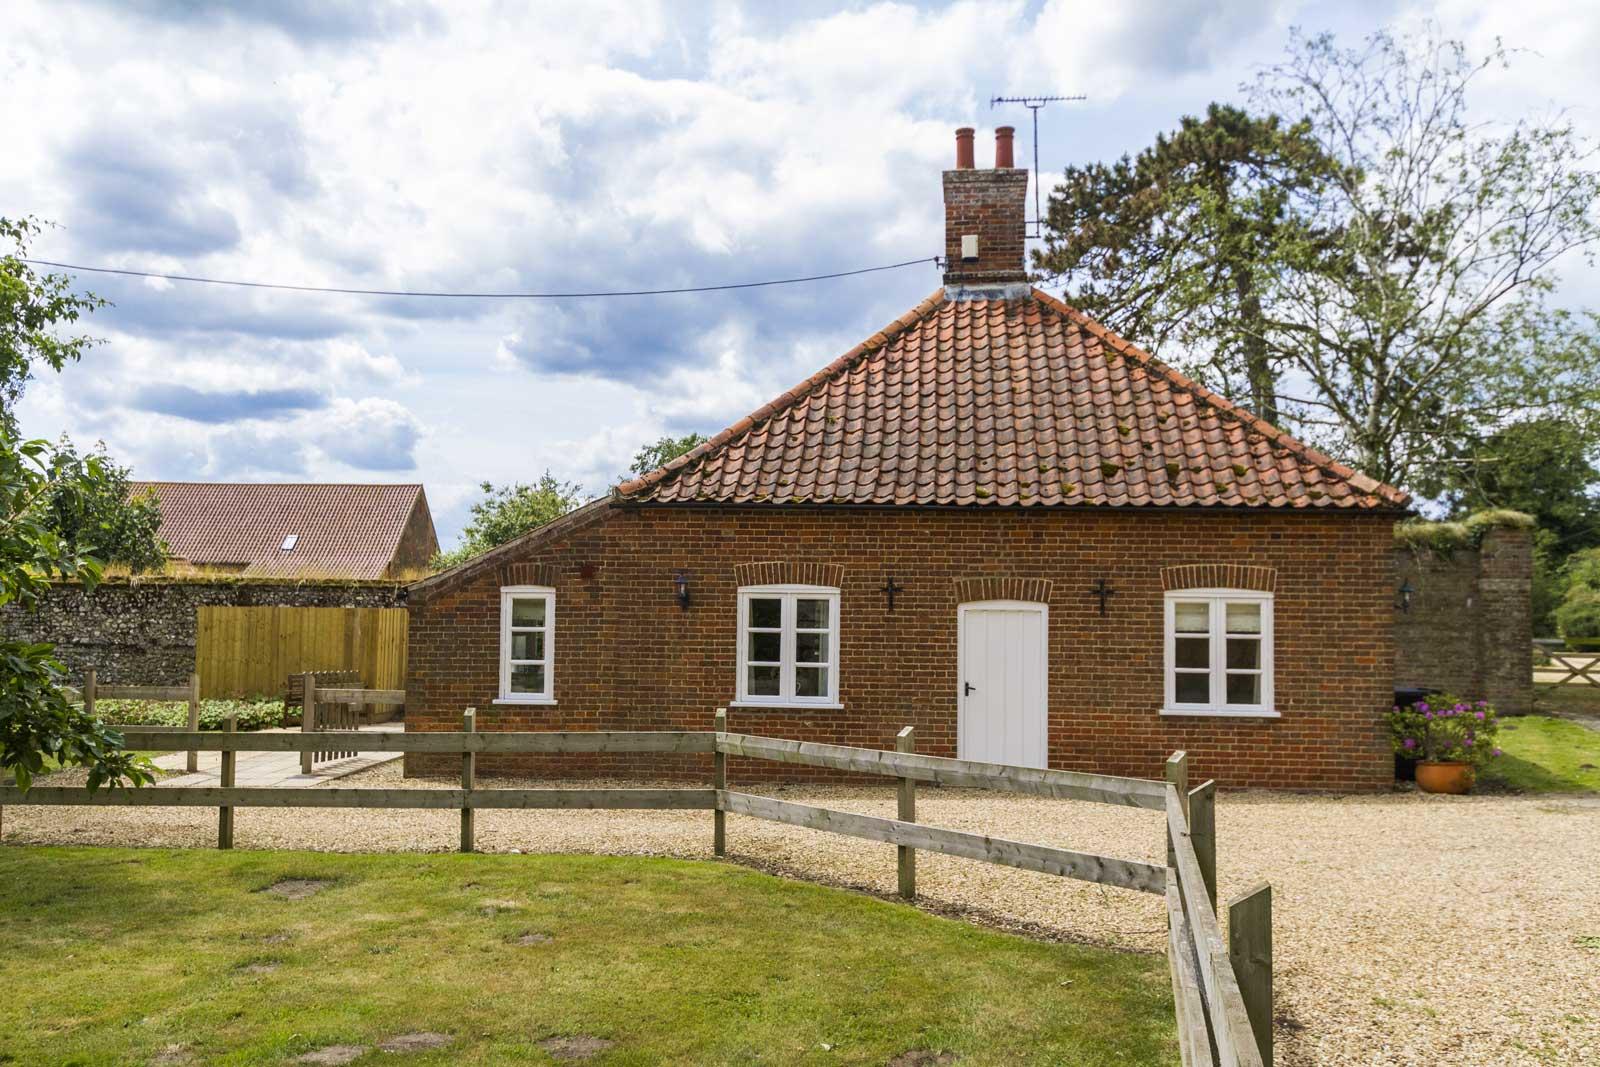 Church farm Barns - Norfolk Disabled Friendly Cottages